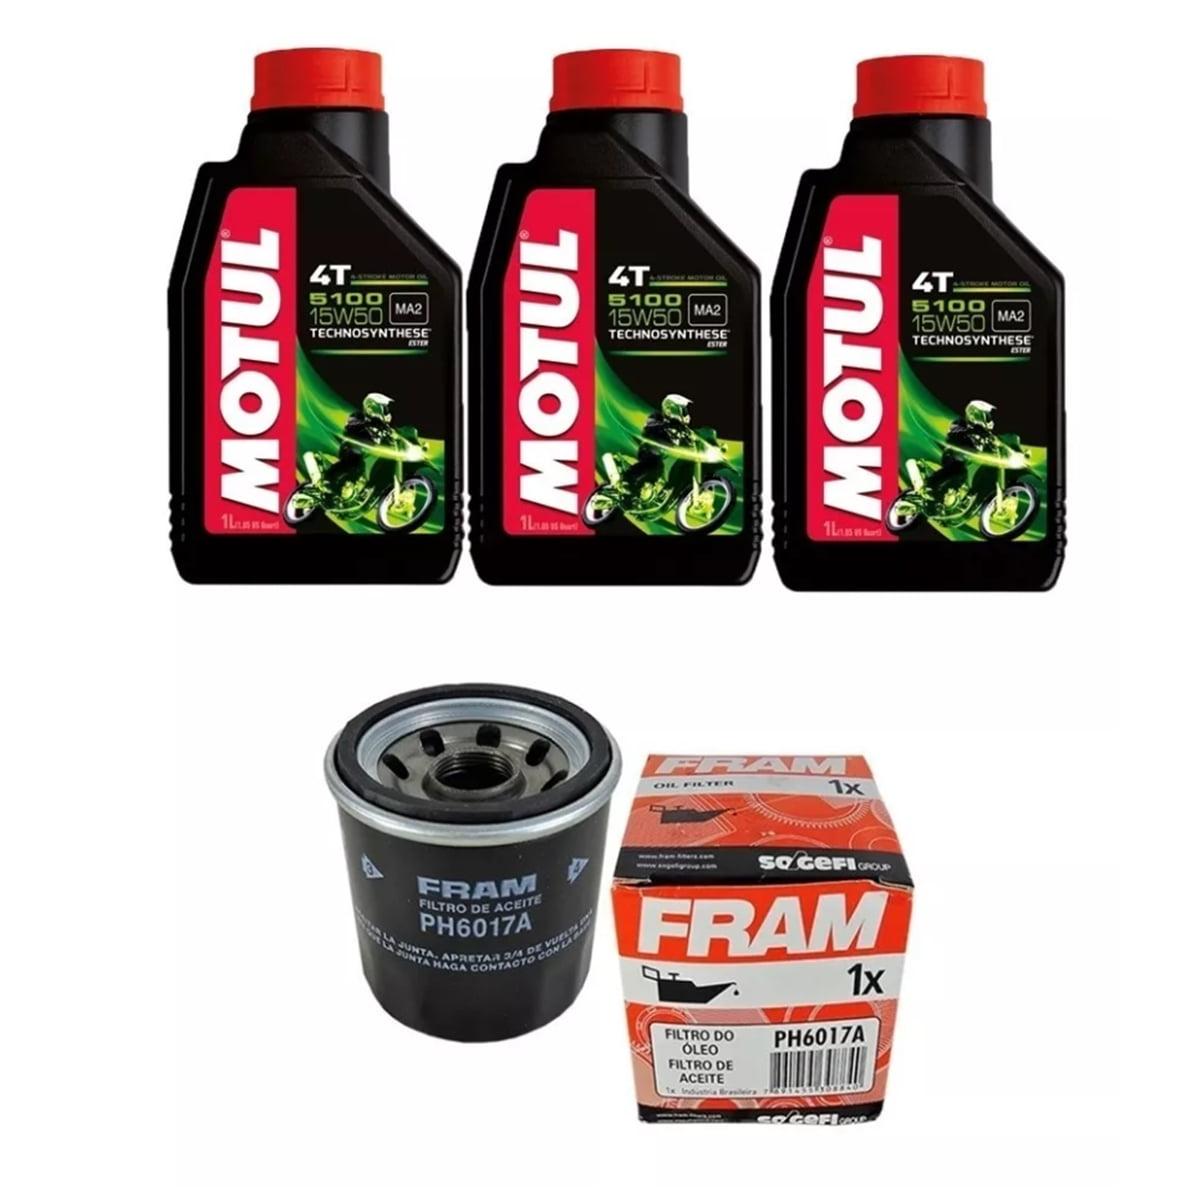 Kit Troca Oleo Motul 5100 15w50 4t 3l + Filtro Ph6017 Moto em até 6x sem juros